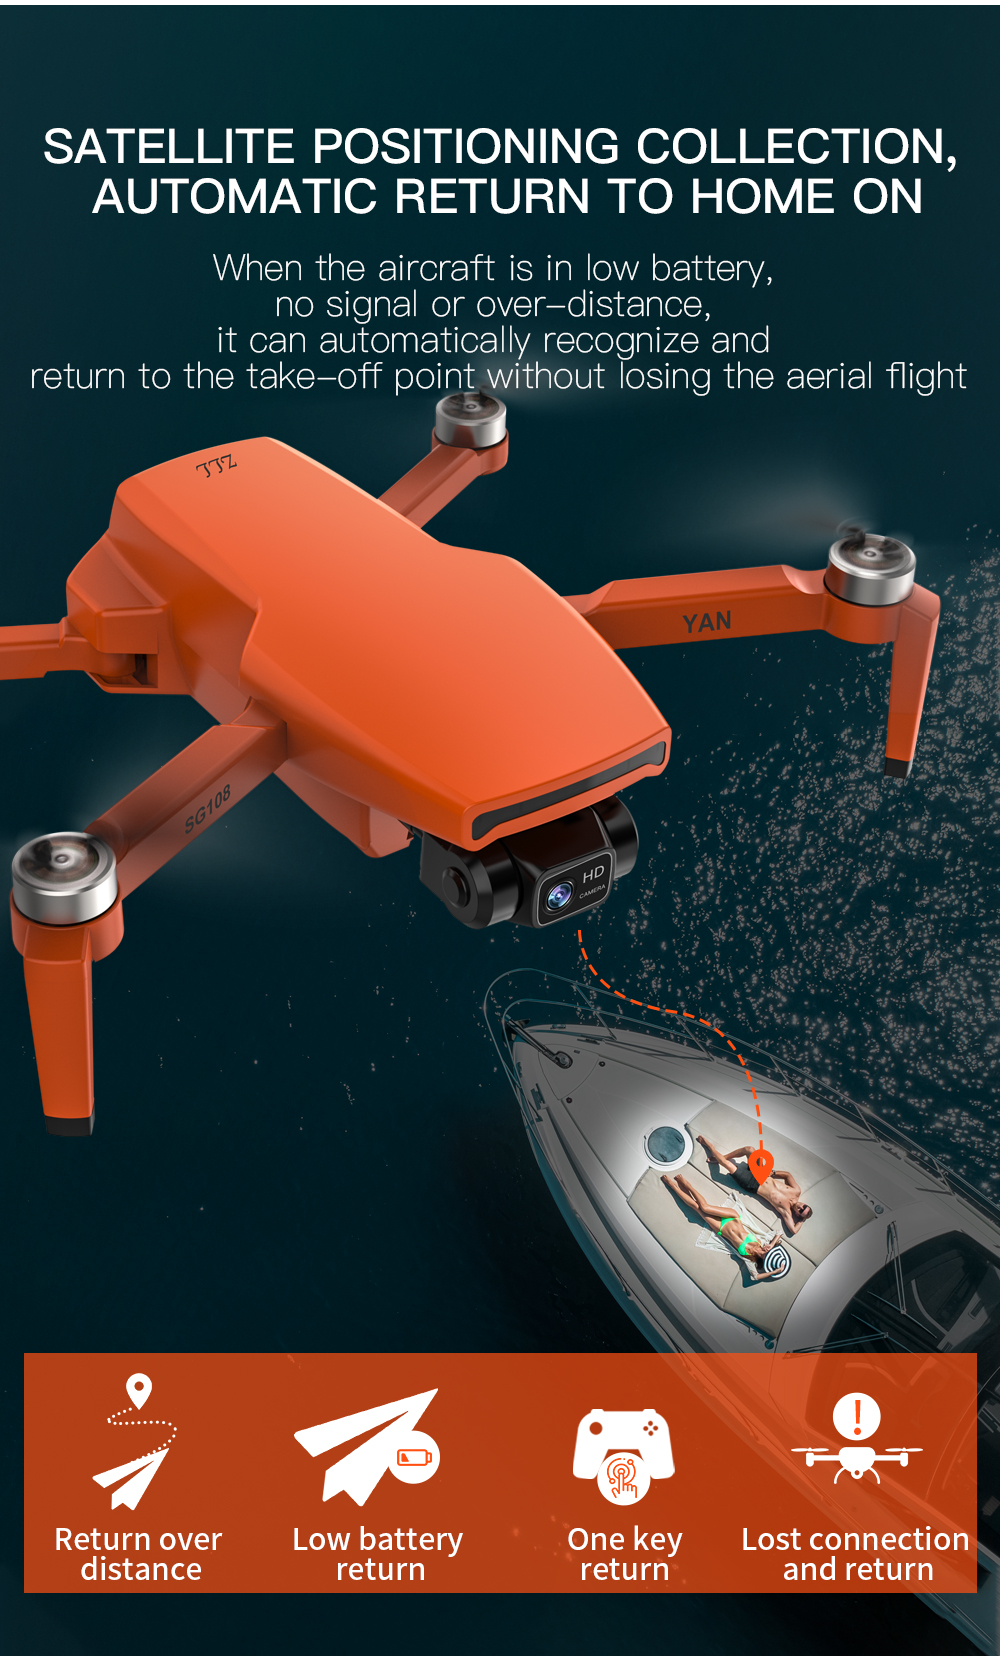 Hfe77bb47156541929eb3dc97aaf26404n - ZLL SG108 Pro GPS Drone With 5G Wifi FPV 4K HD Dual Camera Brushless RC Foldable Quadcopter 1000m Control Distance Dron VS KF102